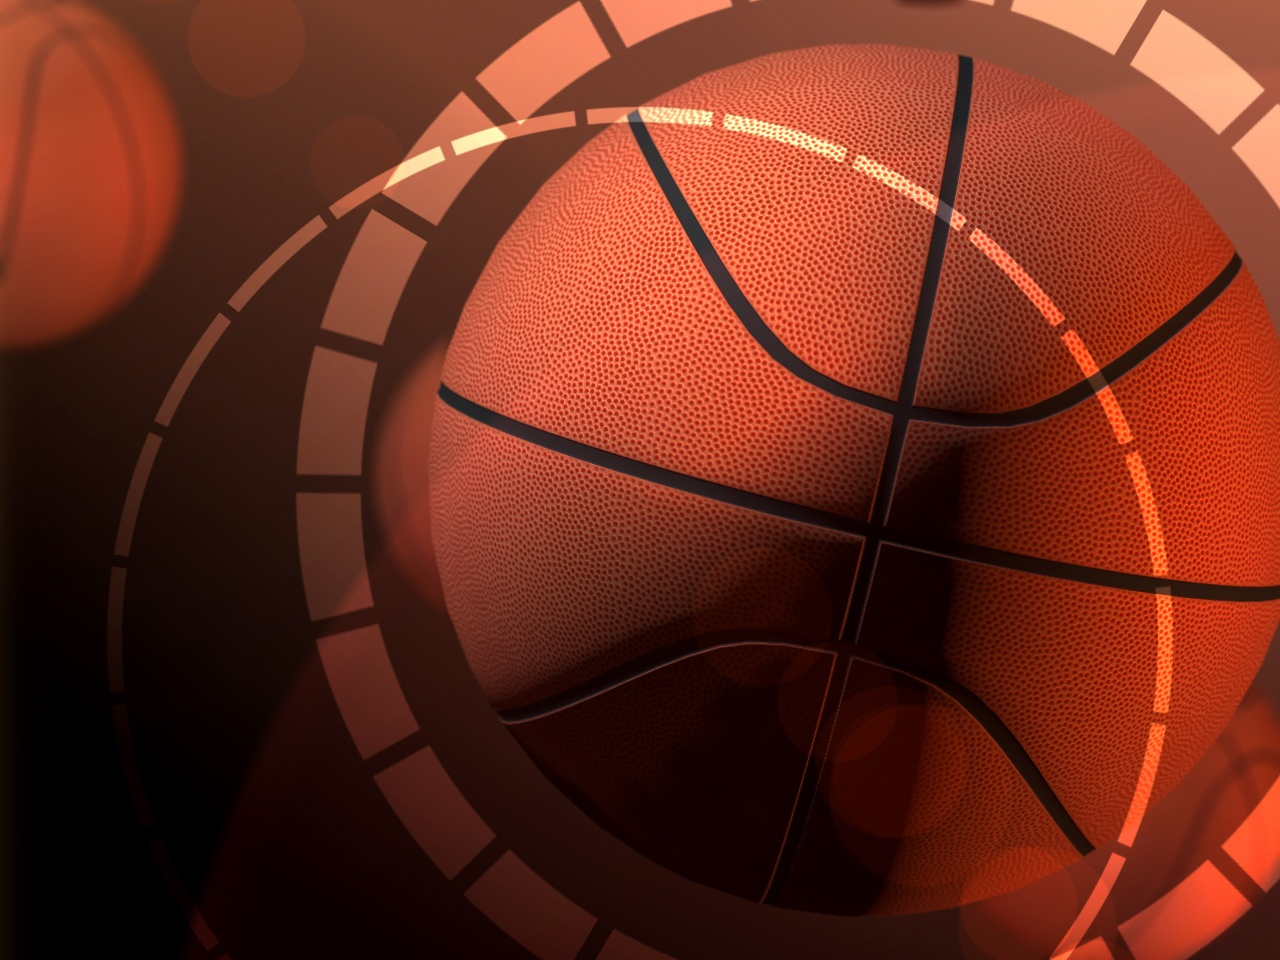 basket bball_1545275151418.jpg.jpg